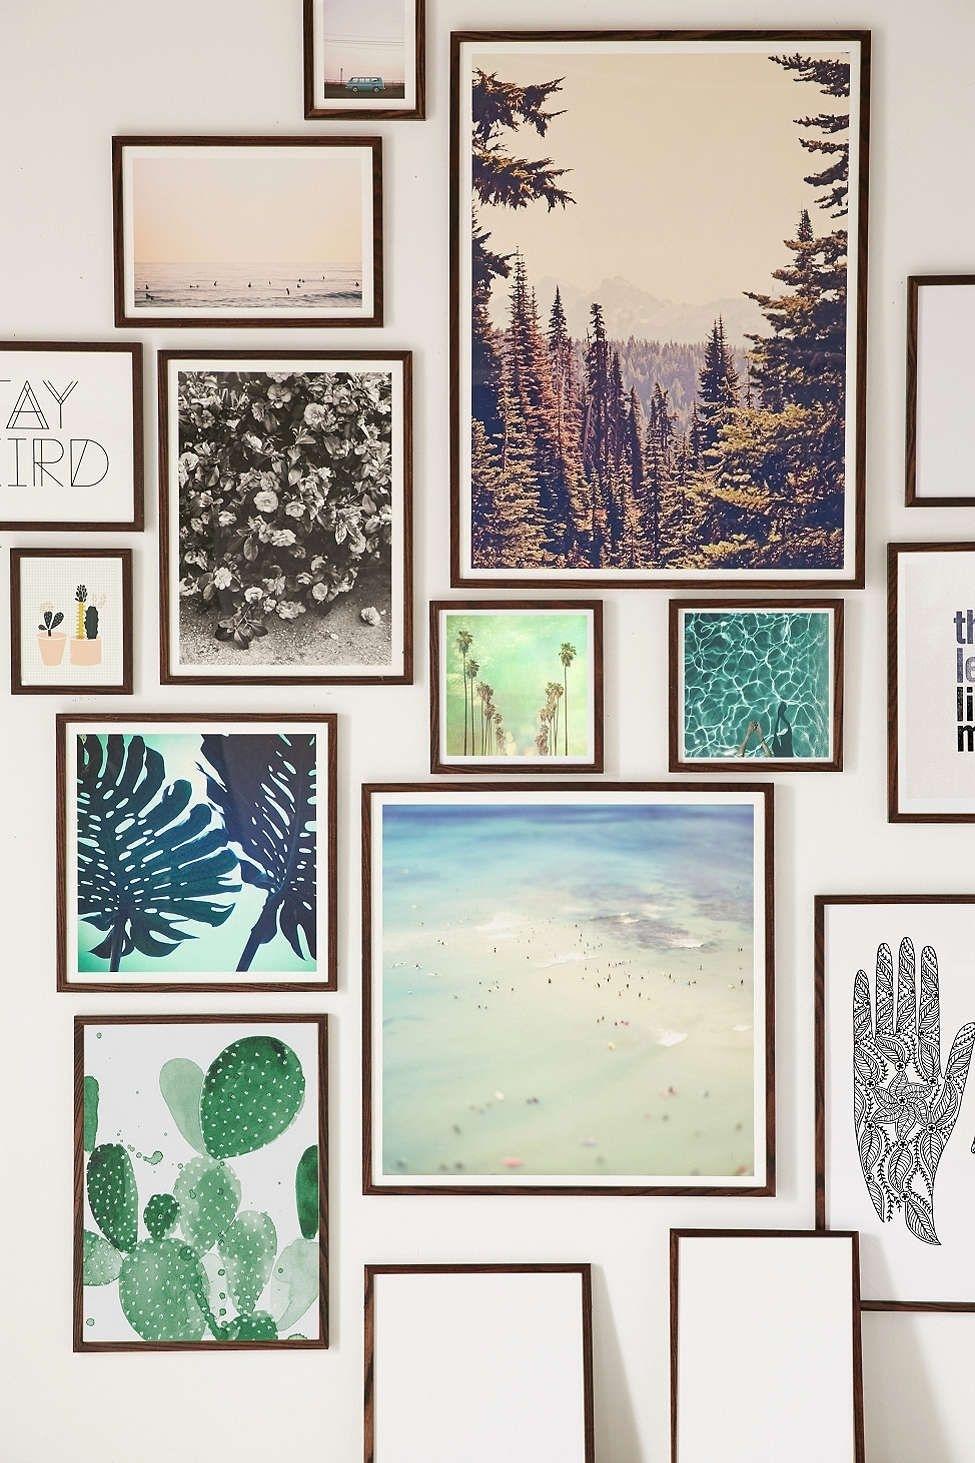 Walnut Wood Art Print Frame | Walnut Wood, Wood Art And Urban For Most Popular Framed Art Prints For Bedroom (View 2 of 15)